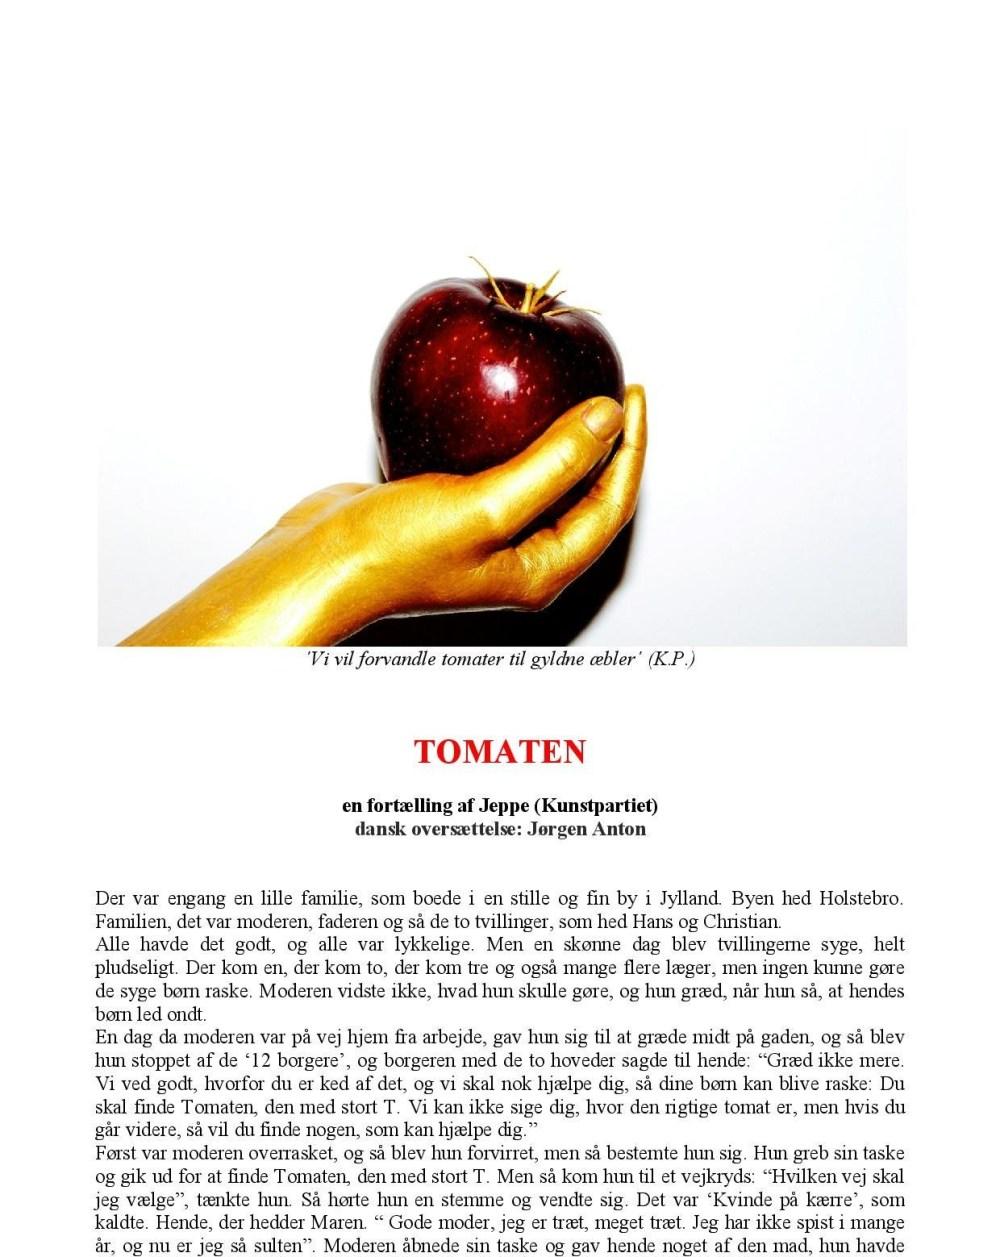 TOMATEN-page-001